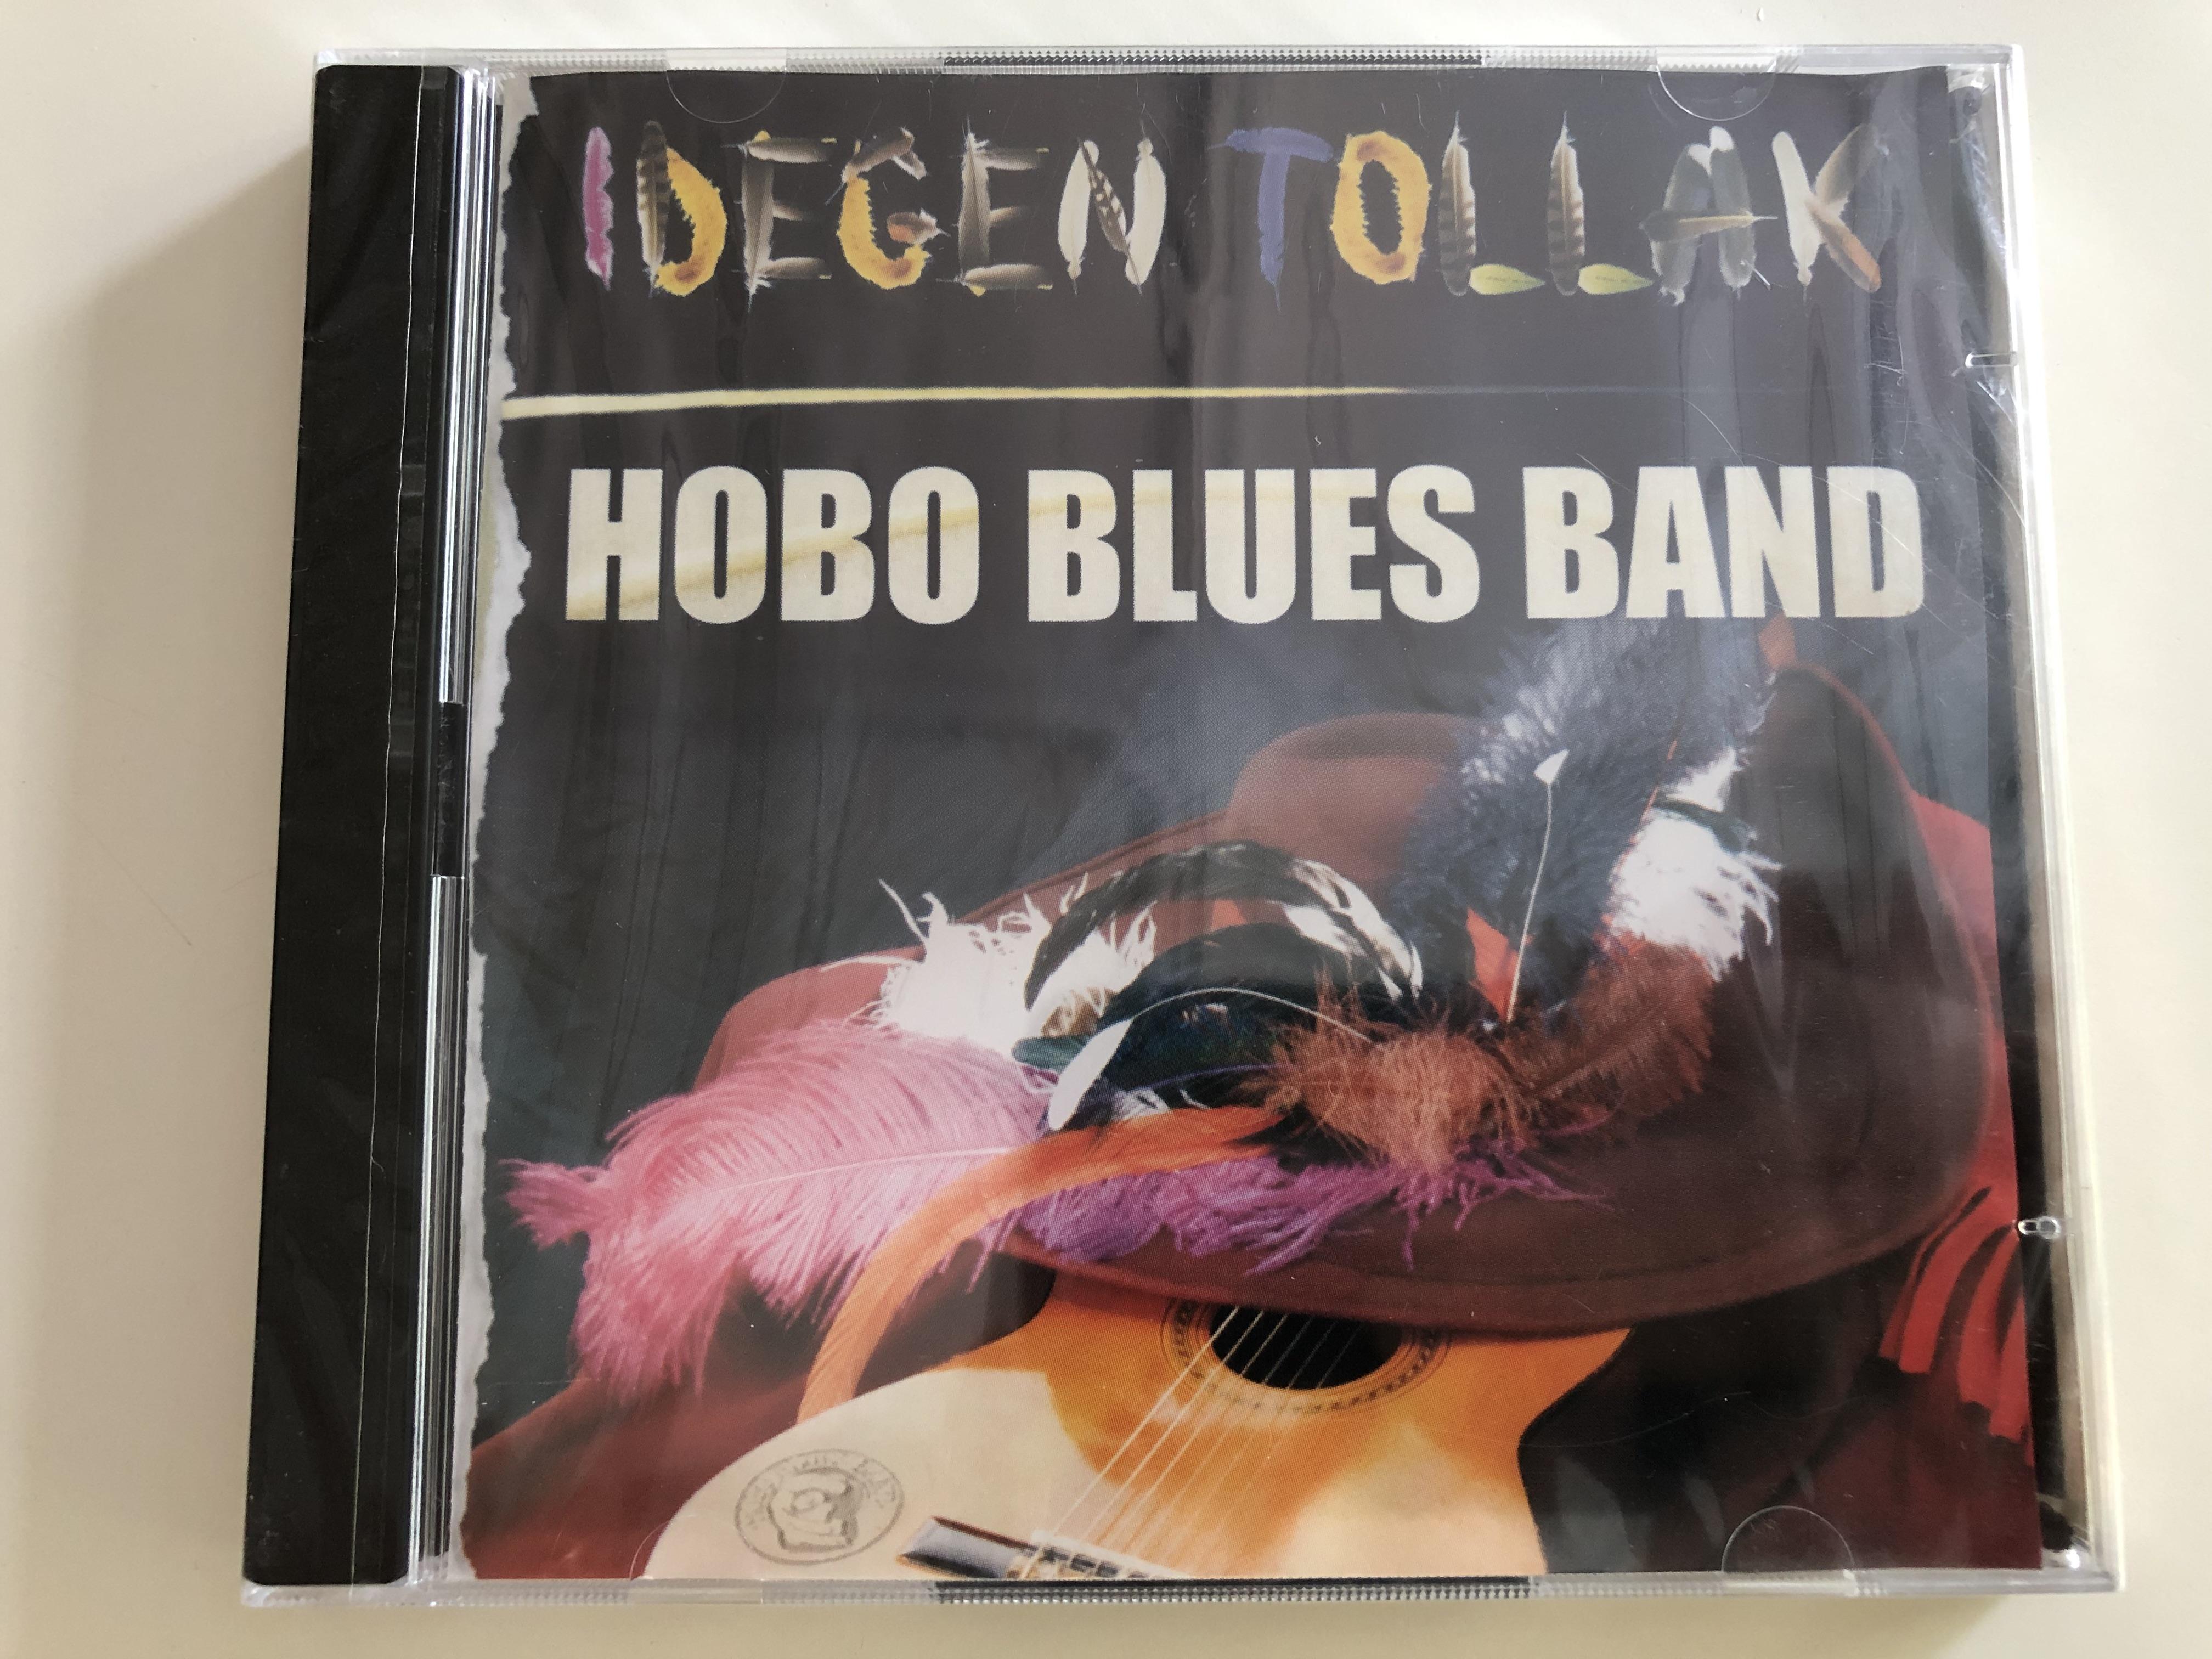 hobo-blues-band-idegen-tollak-2x-audio-cd-2004-rock-hard-records-musicdome-rh-04002-cd-1-.jpg